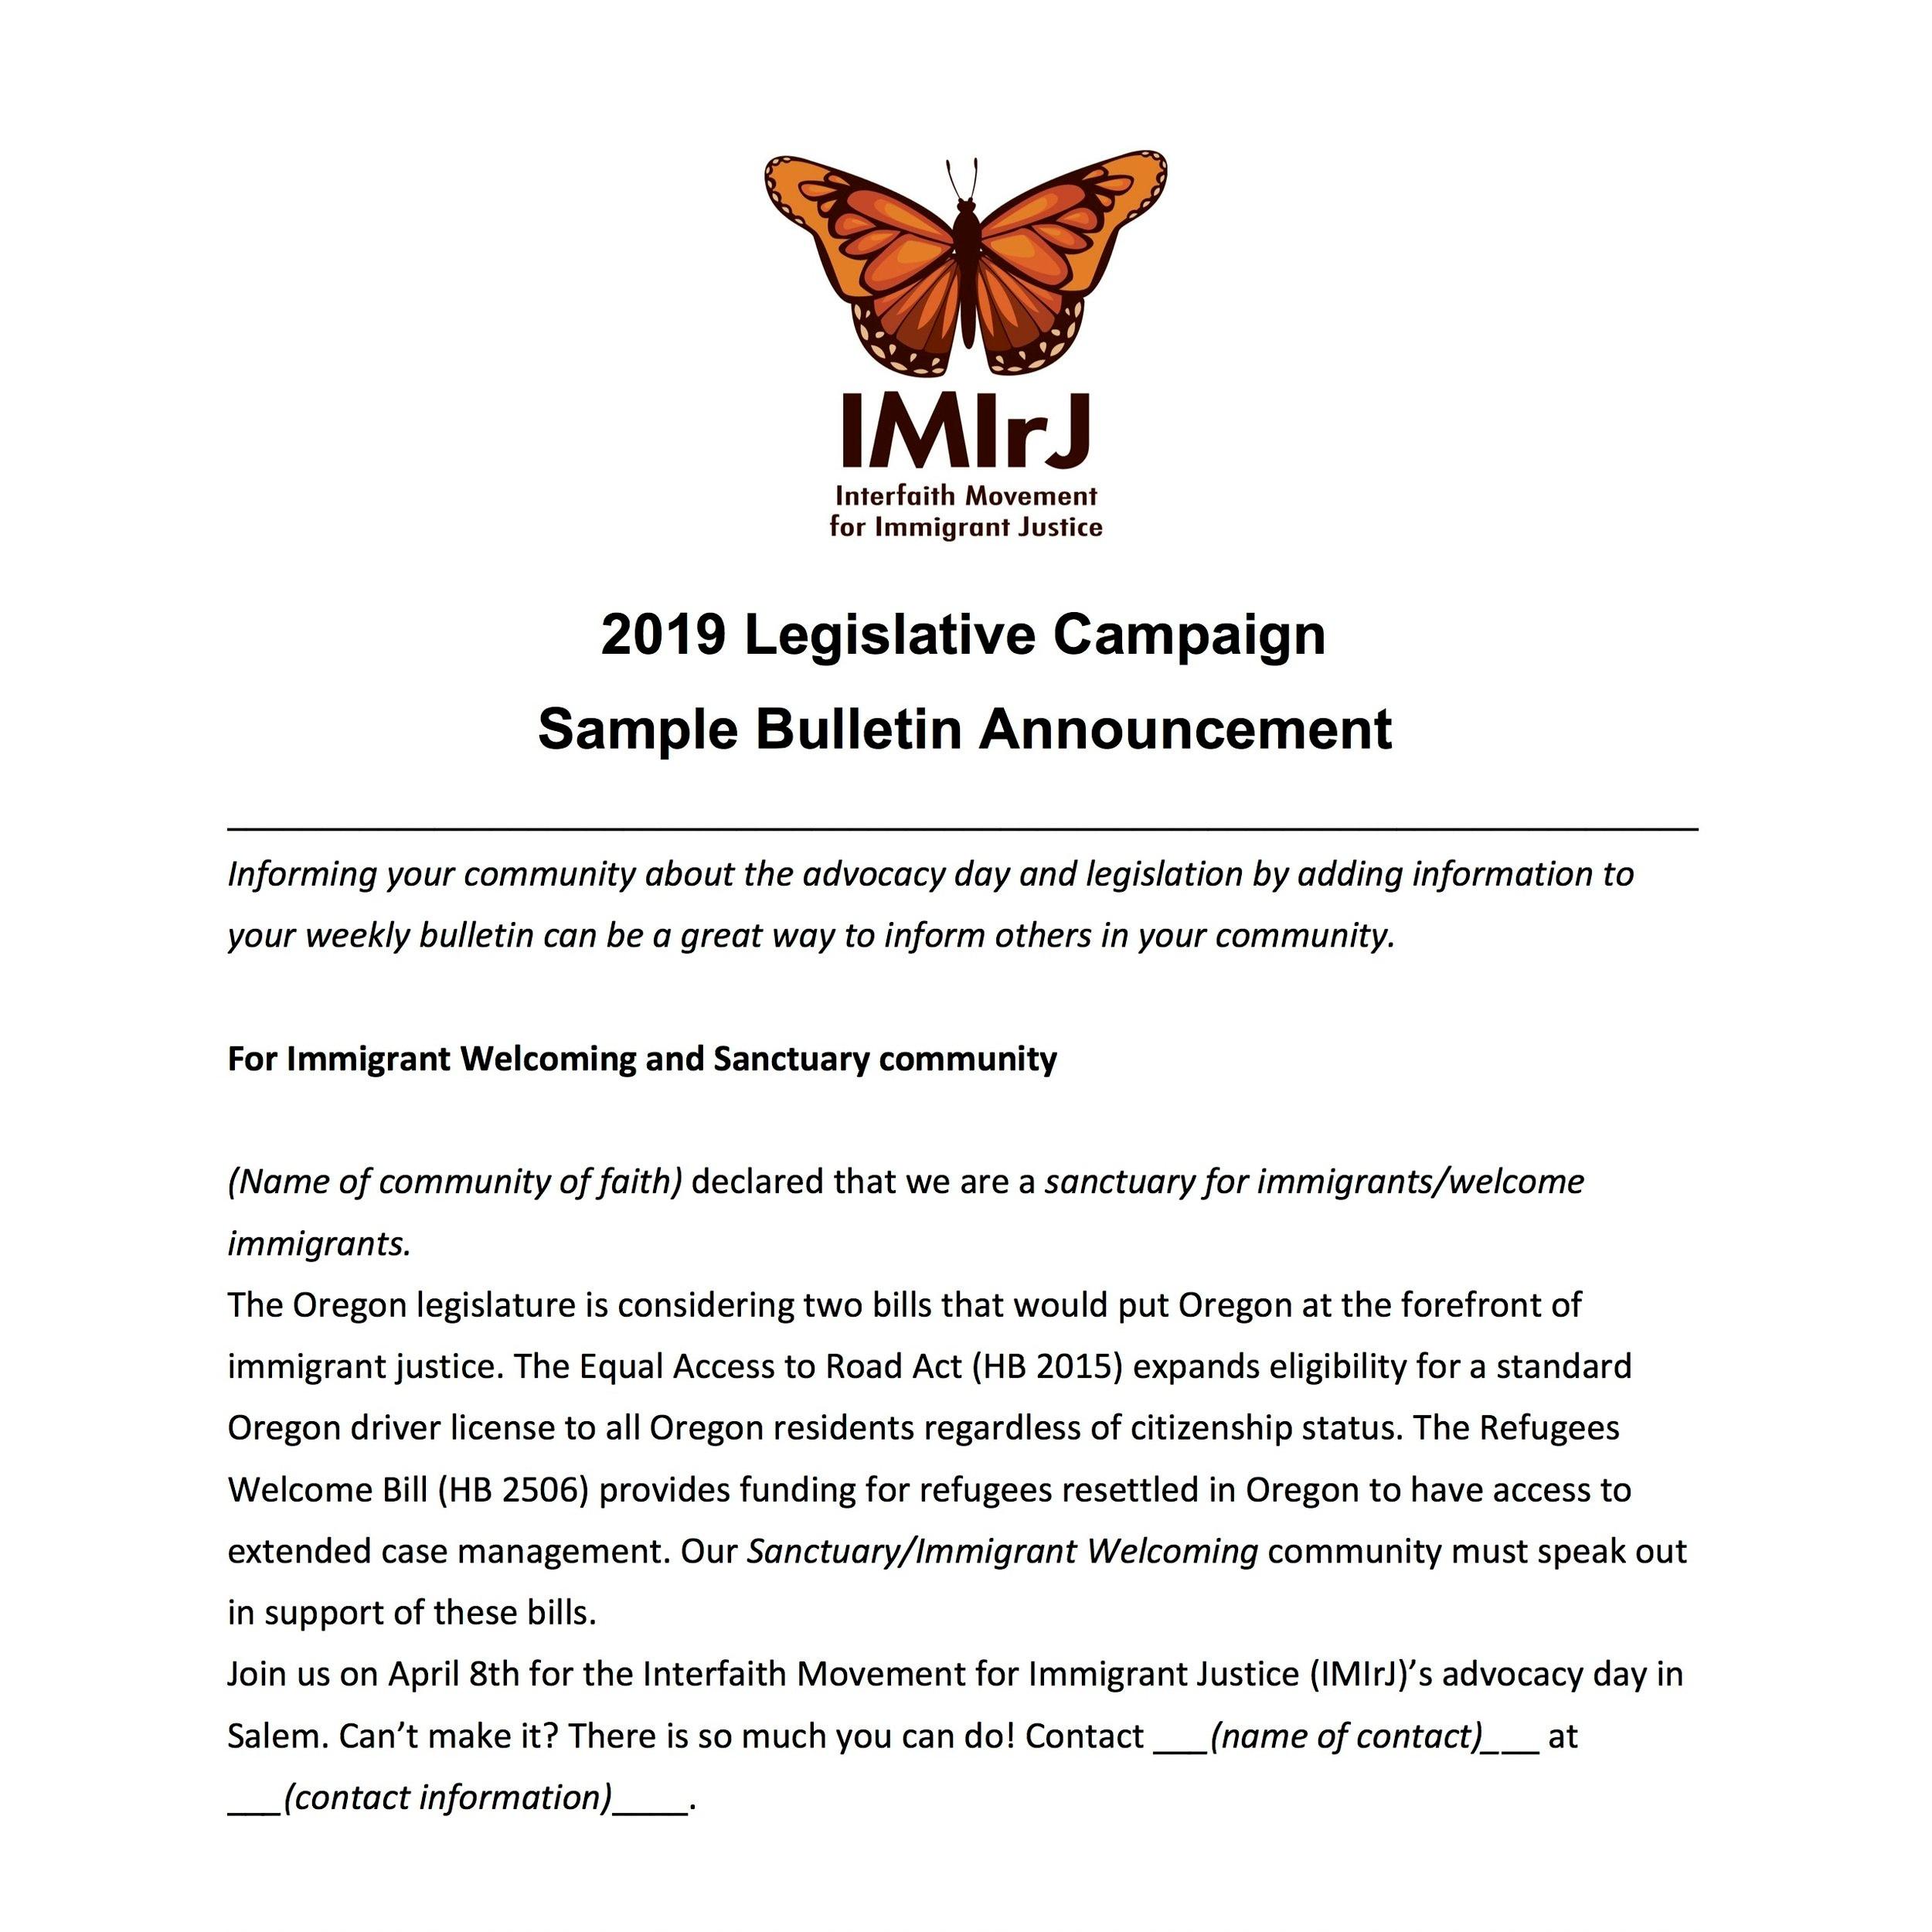 Sample Bulletin Announcements